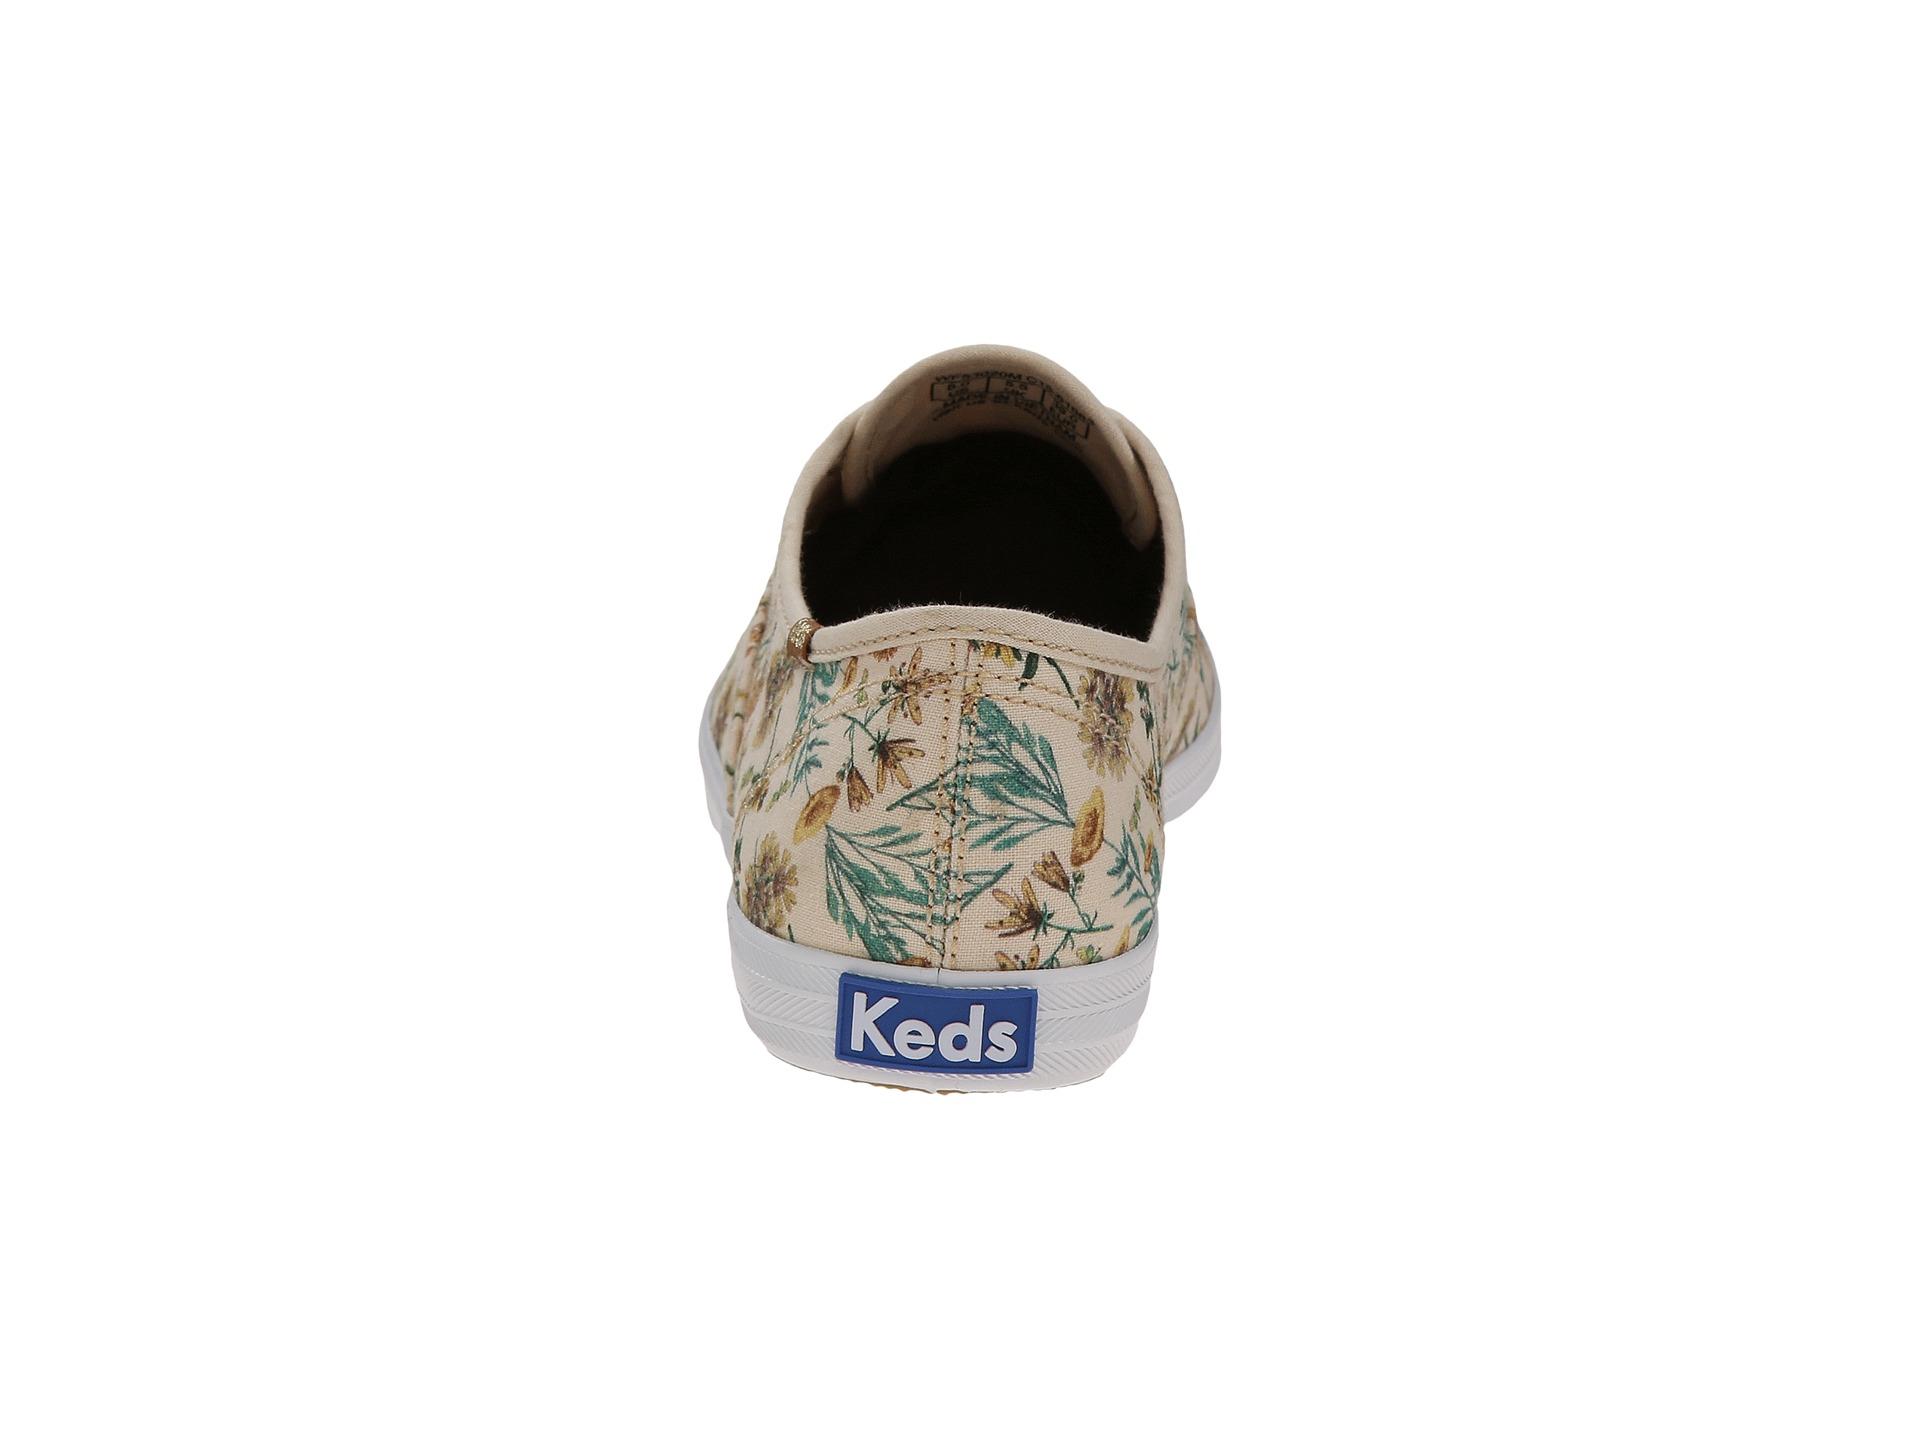 Keds Light Brown Shoes